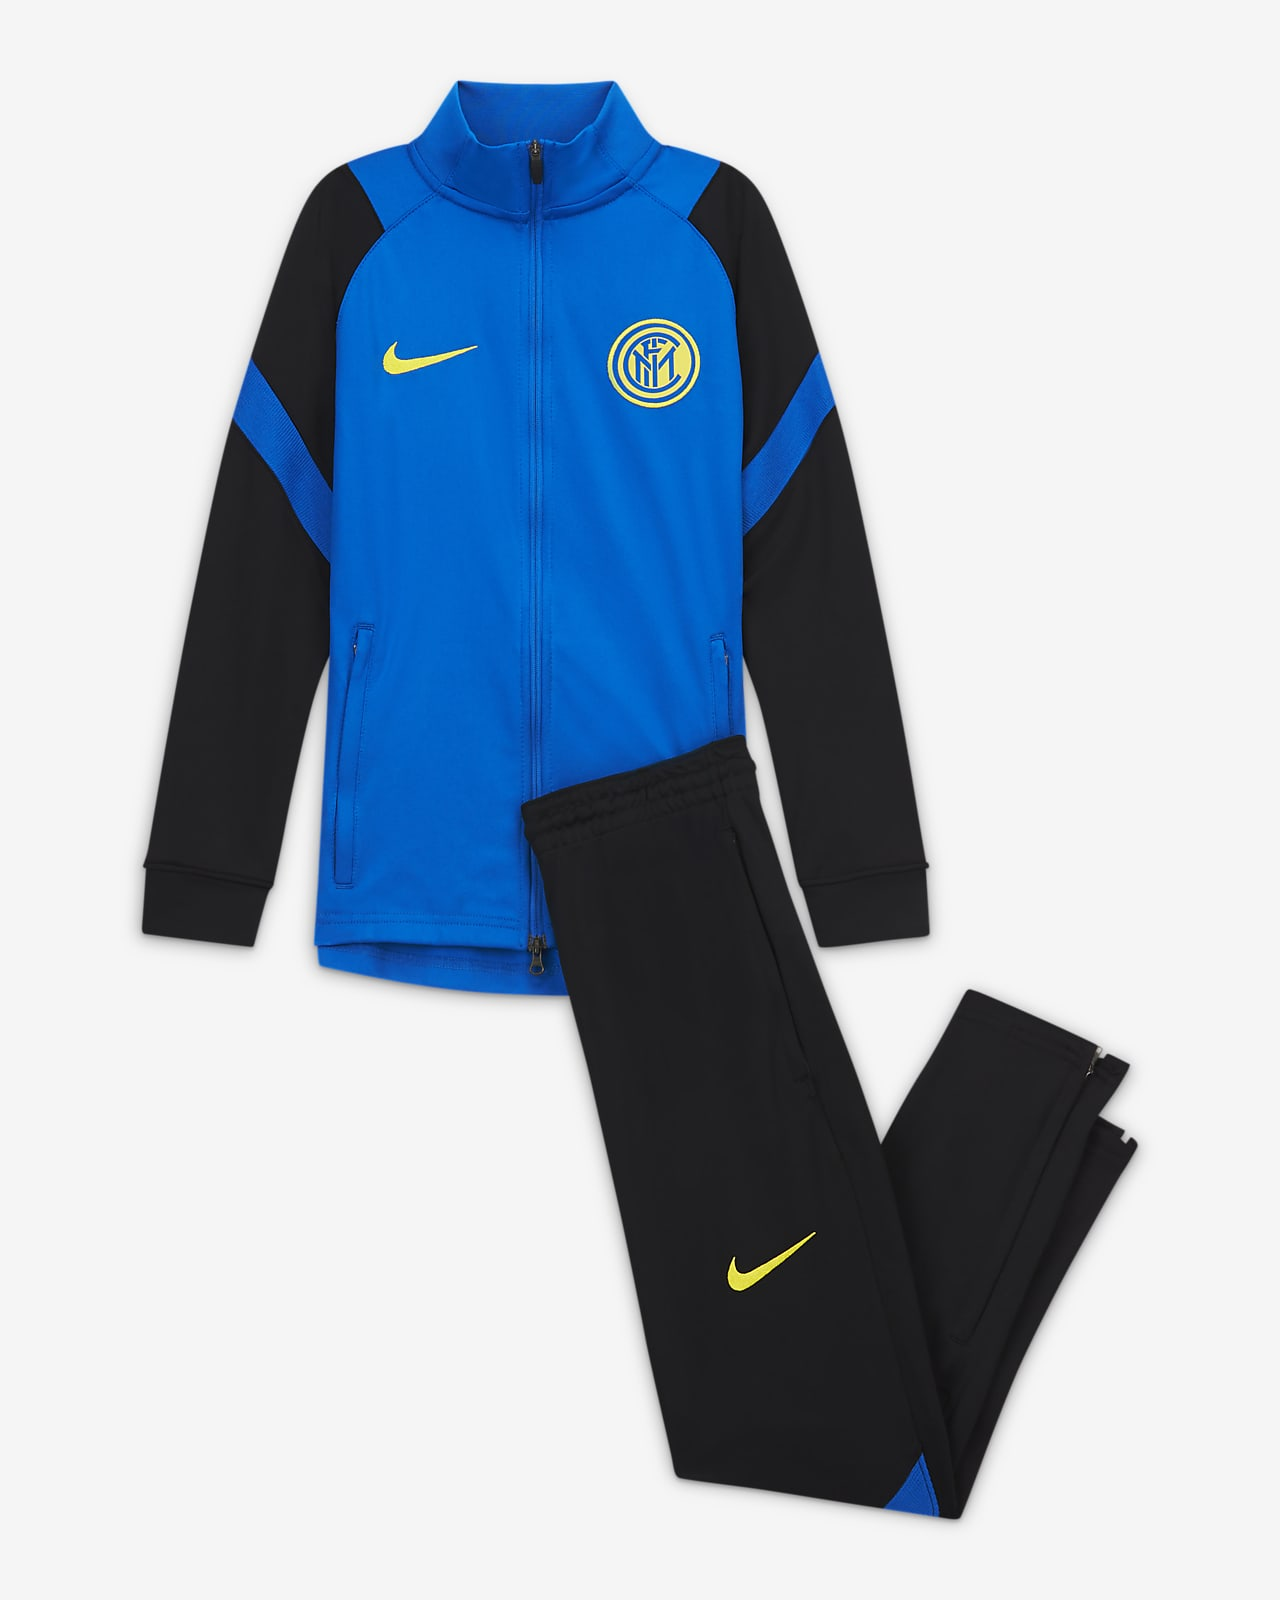 Inter Milan Strike Knit voetbaltrainingspak voor kids